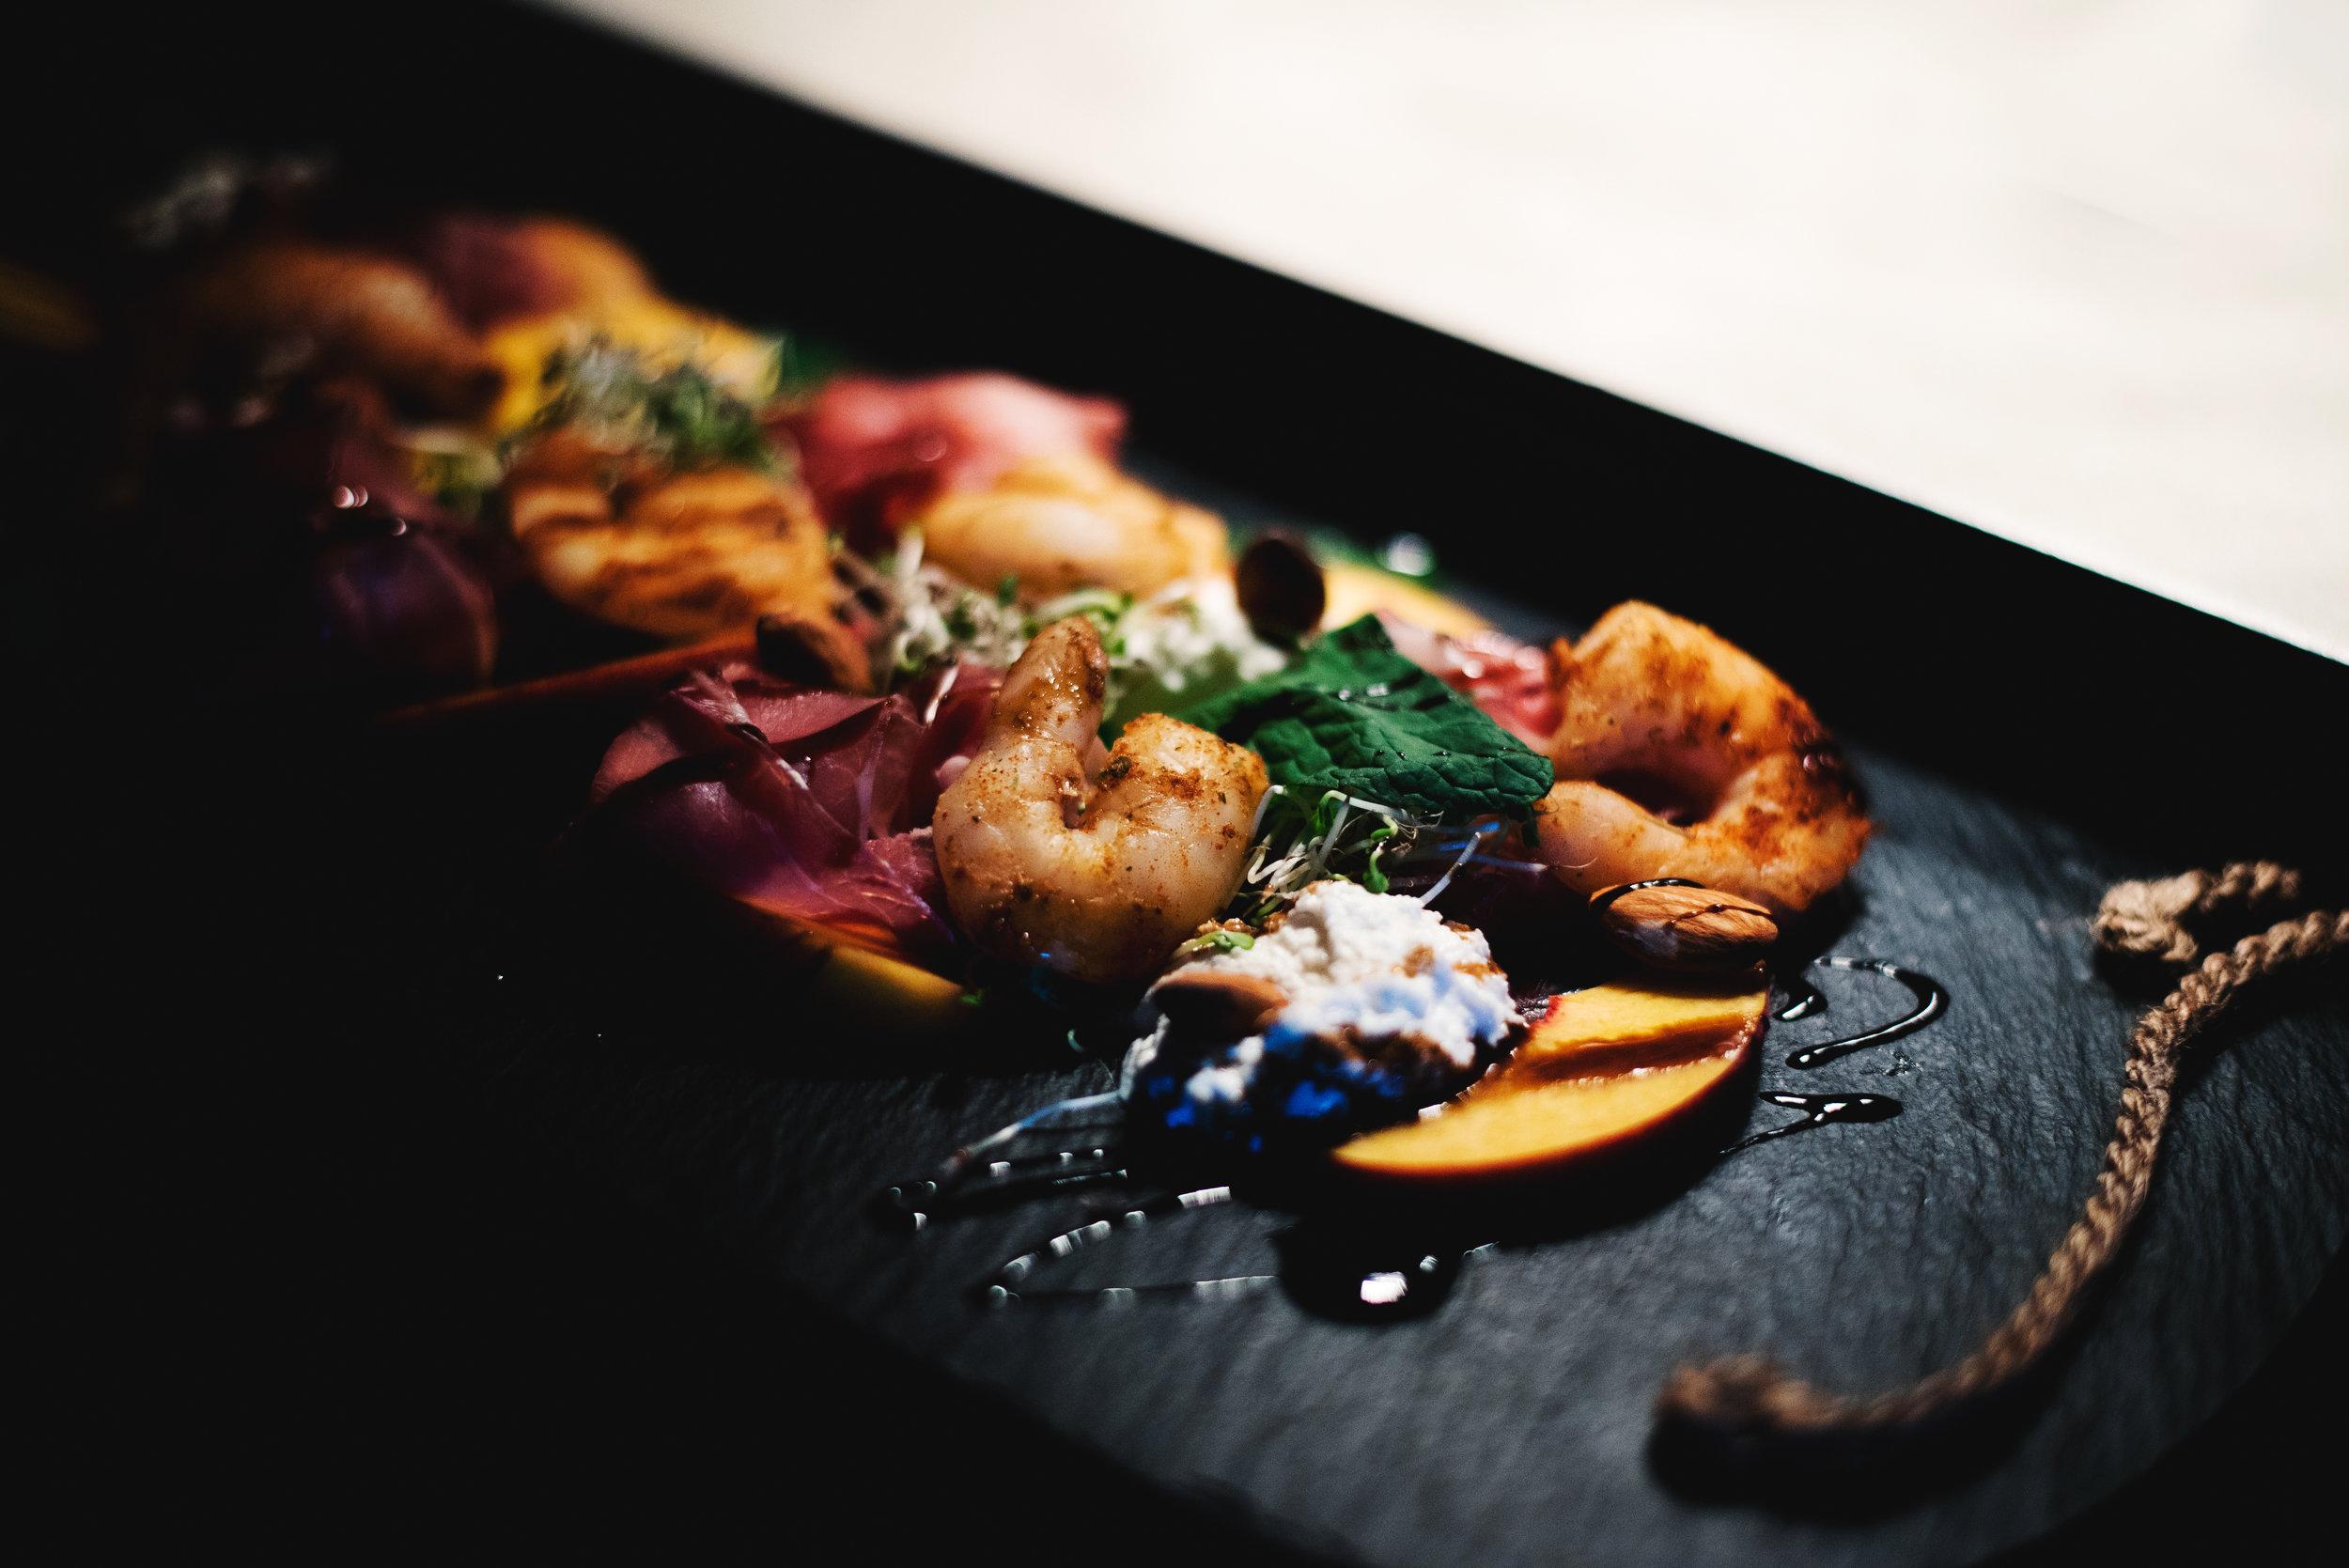 FoodFanaticsLive-Event-Food-Photography047.jpg